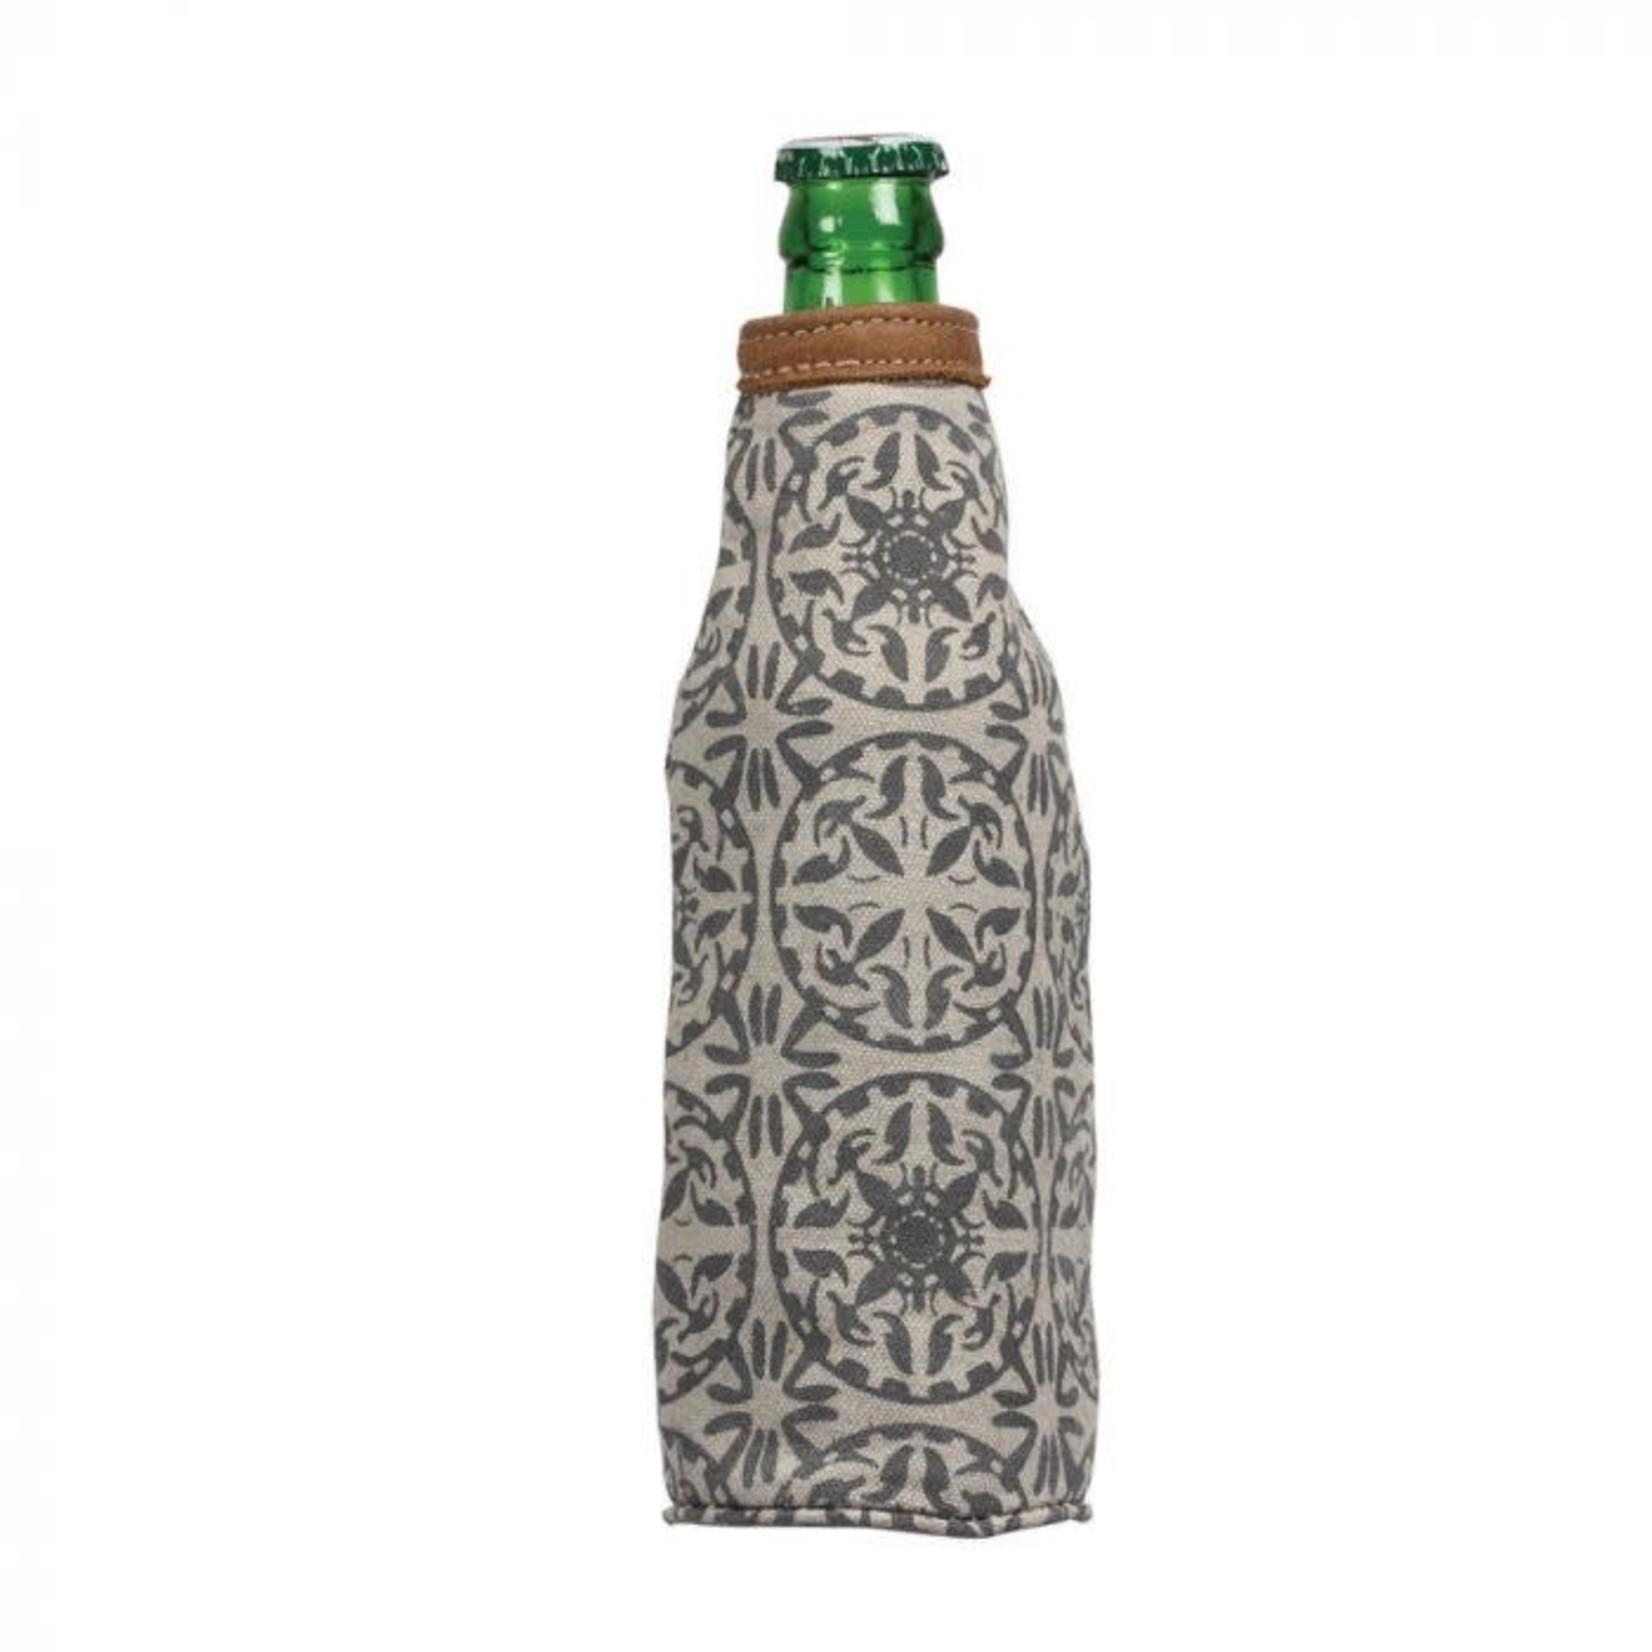 Myra Bag Clique Bottle Koozie